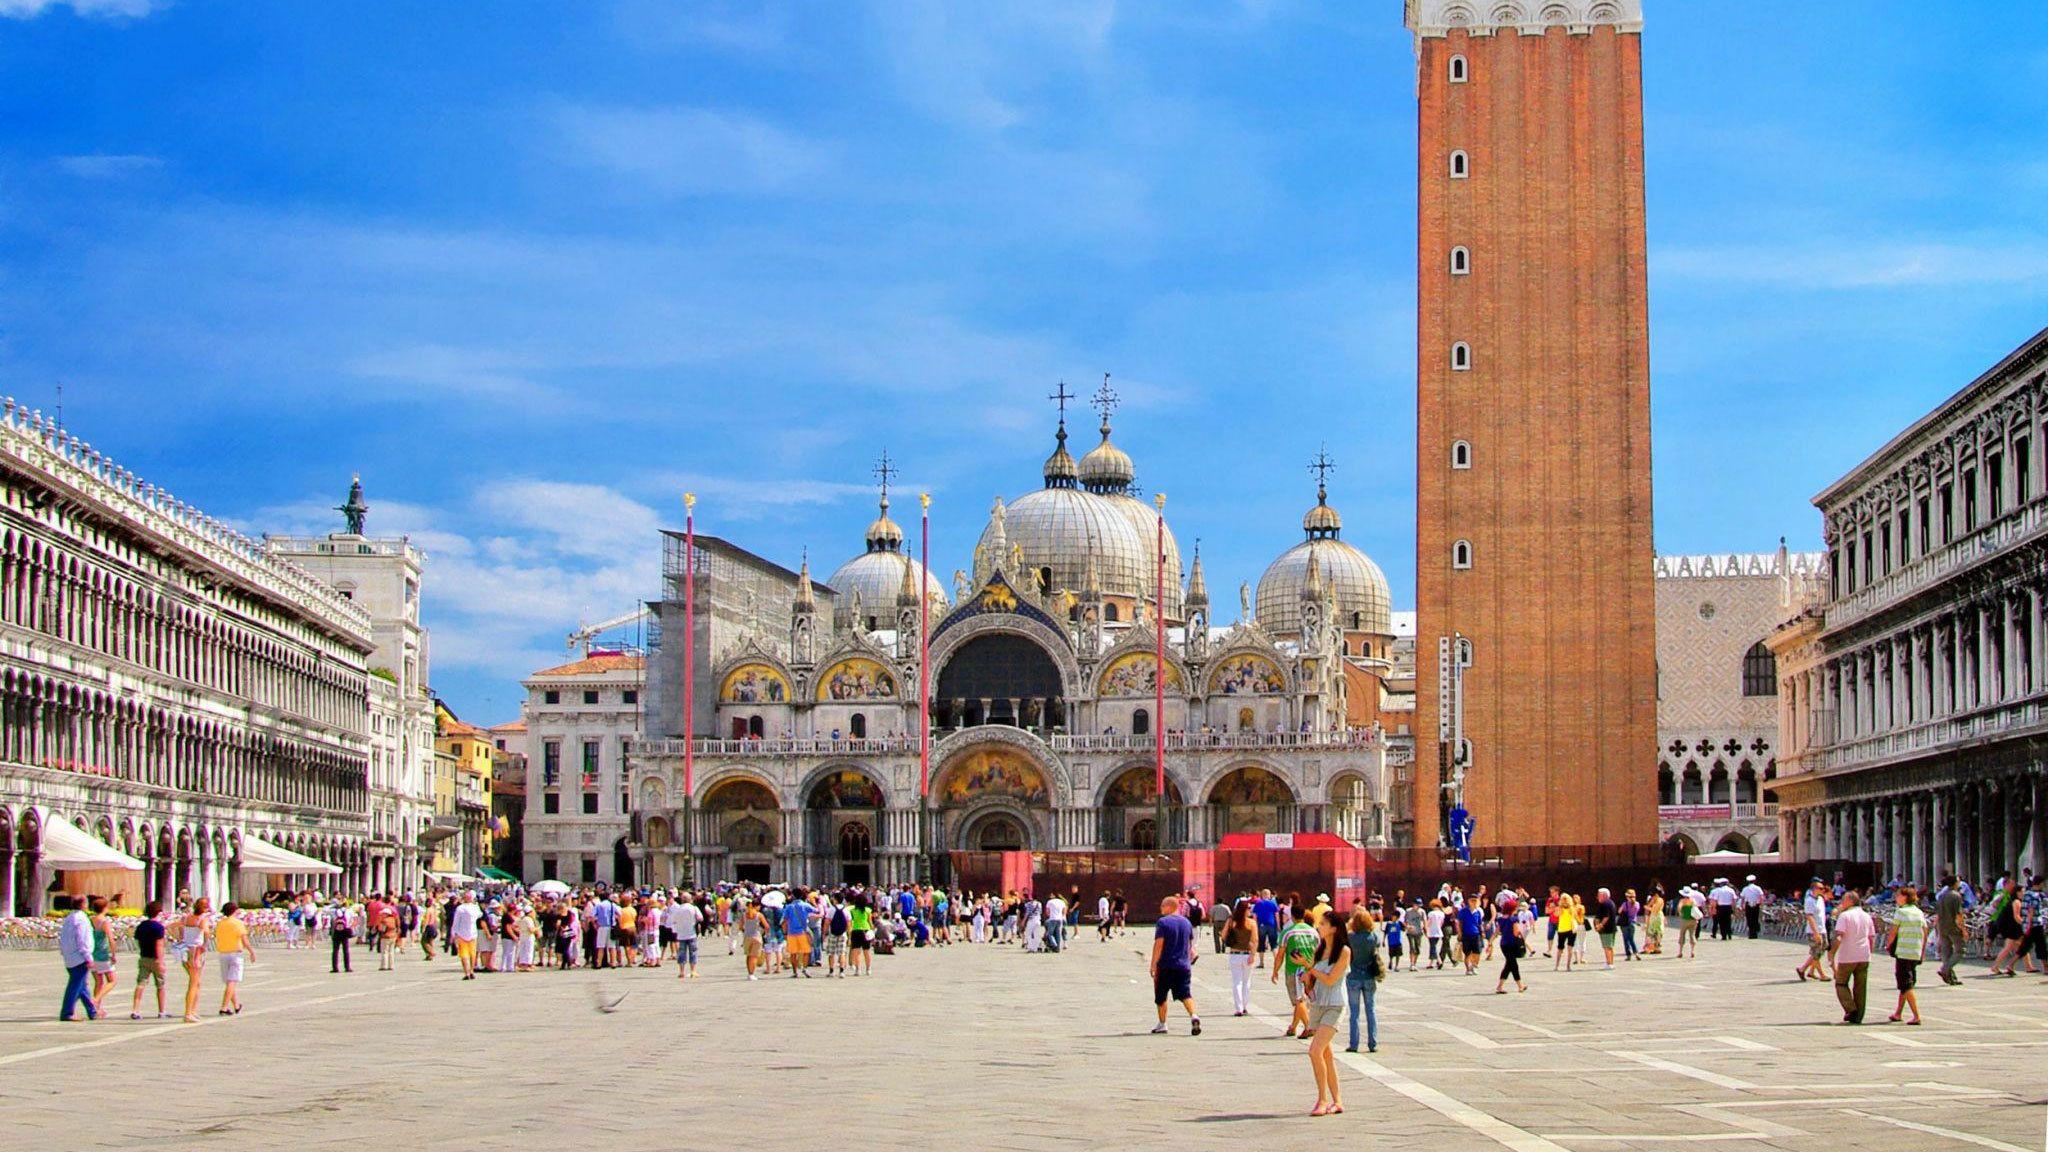 the San Marco Campanile next to Saint Mark's Basilica in Venice